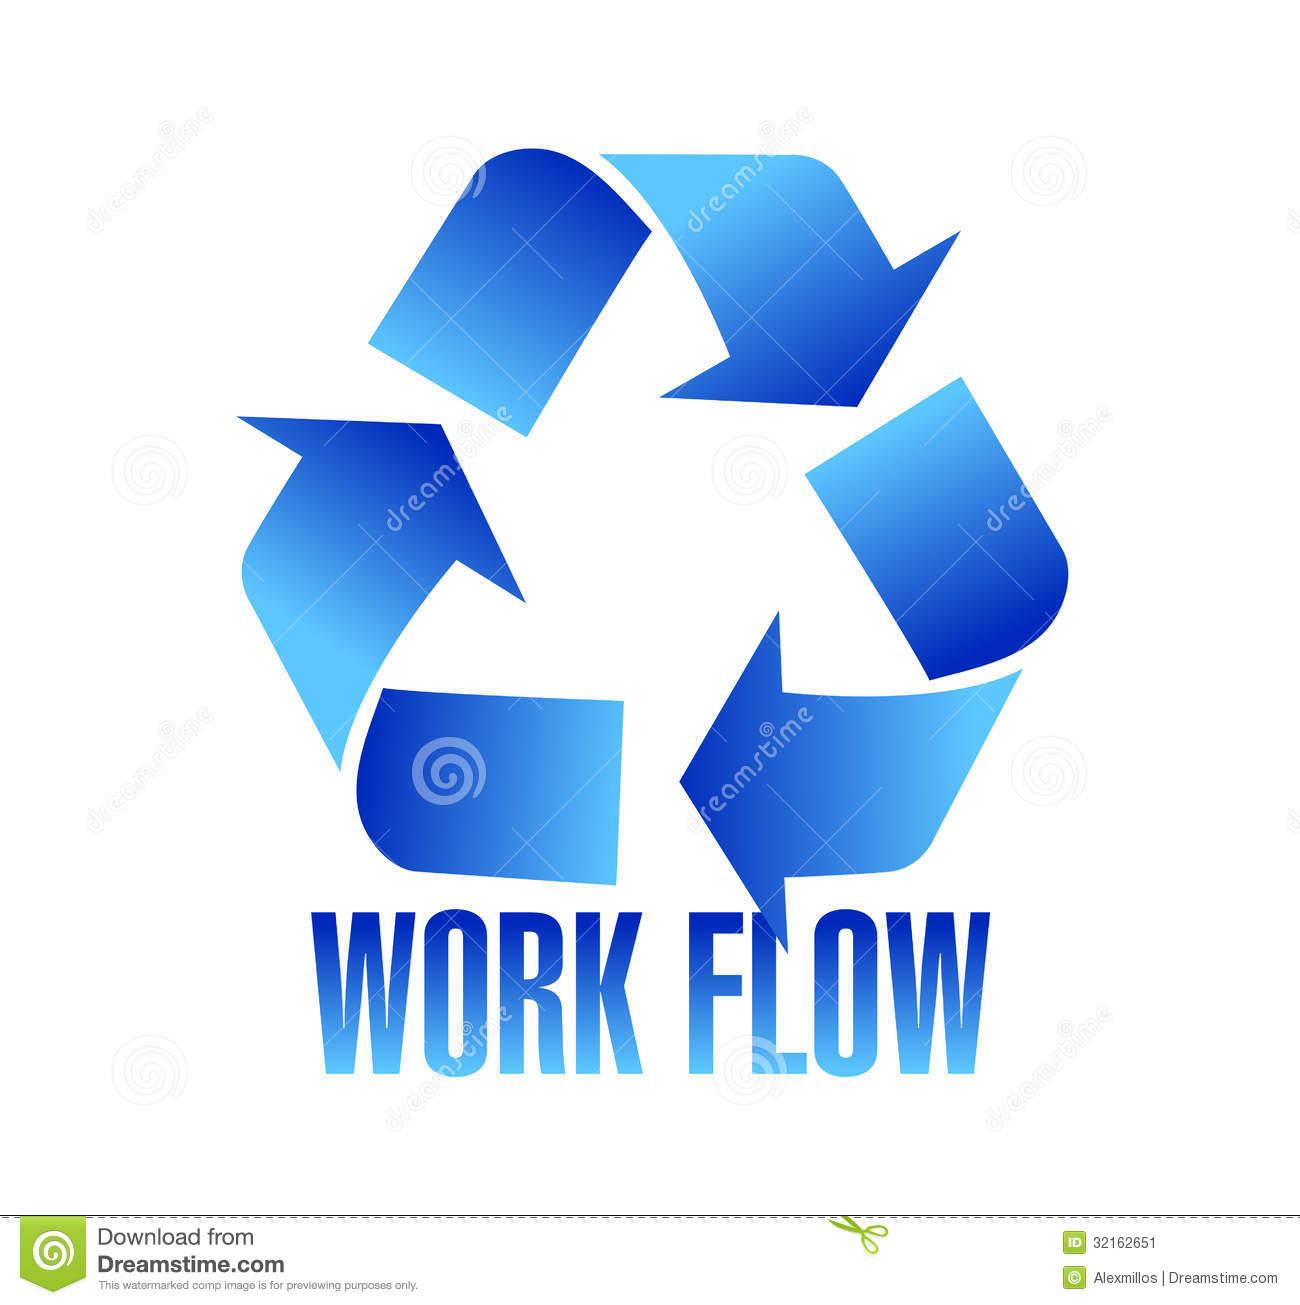 Oracle Apps R12 WorkFlow